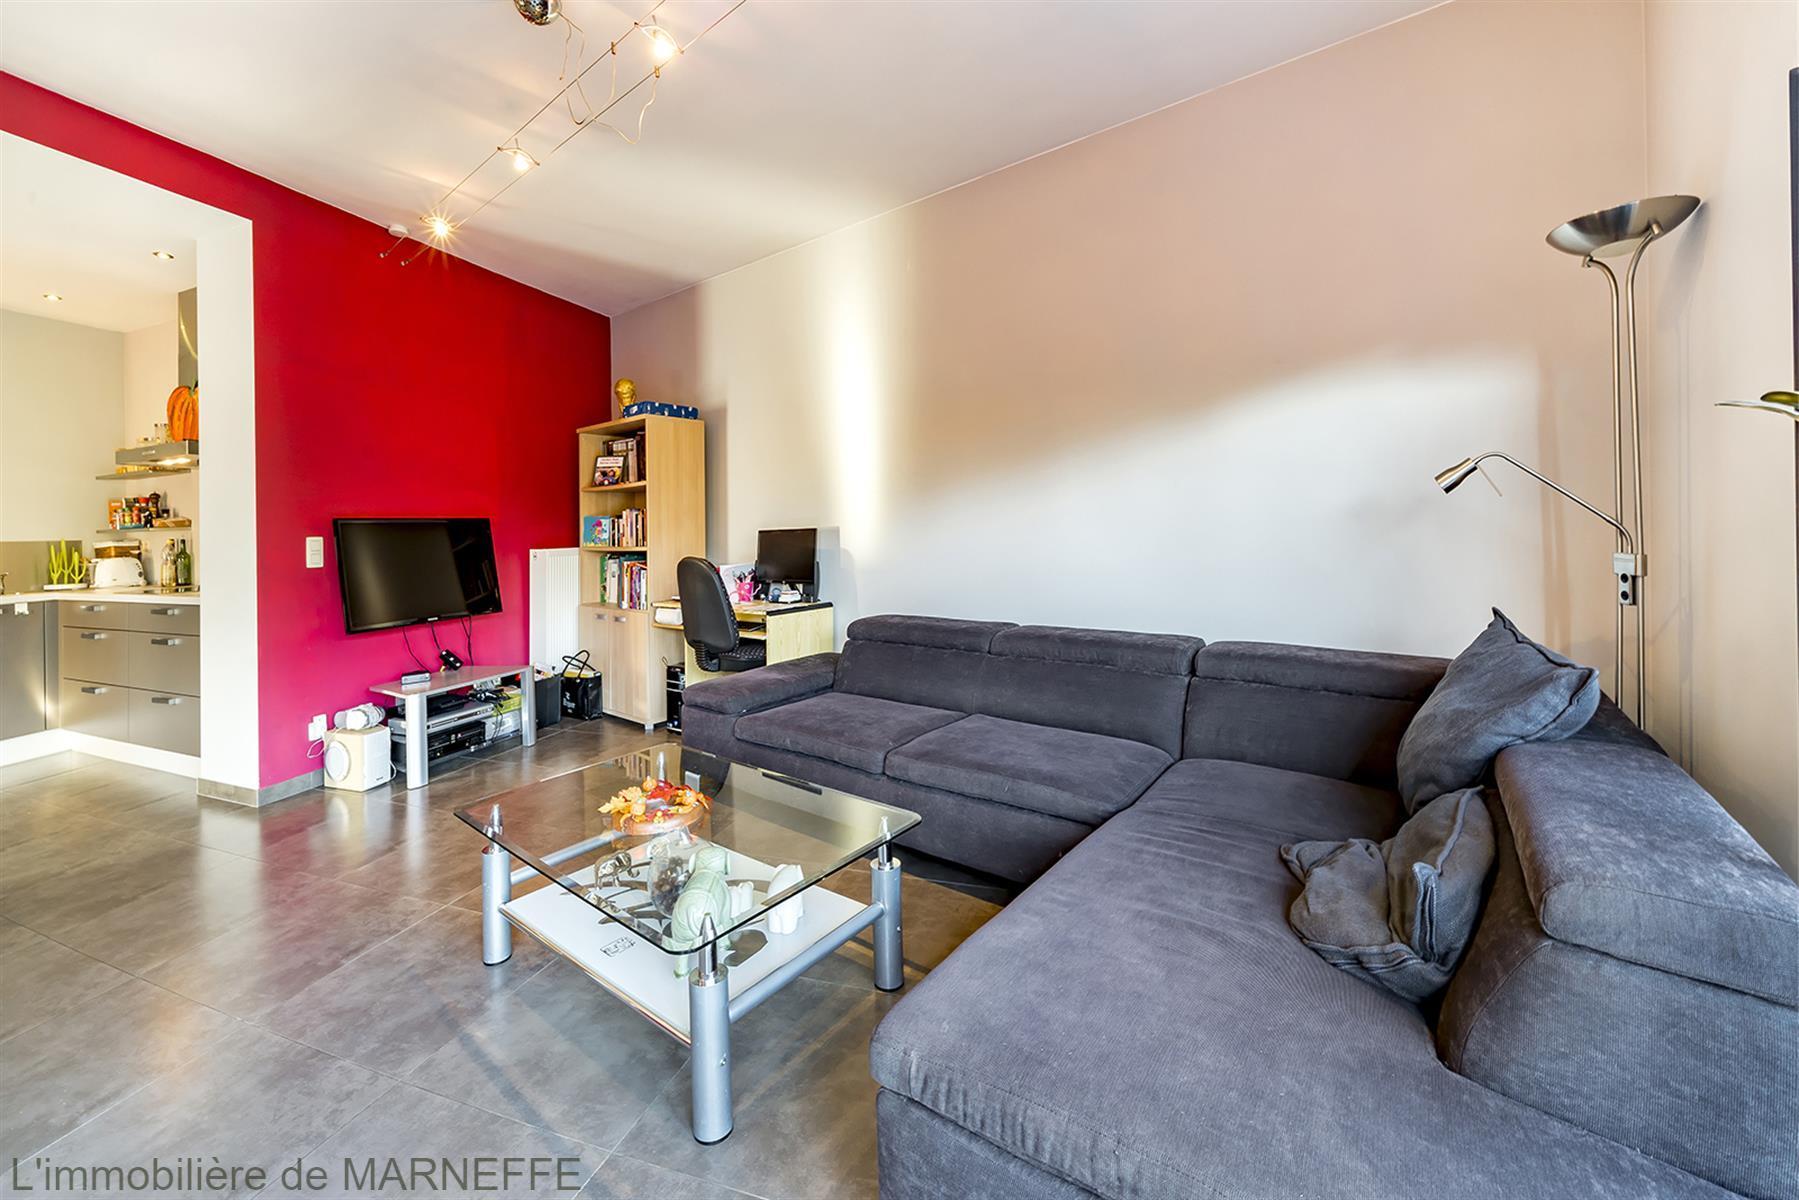 Appartement avec jardin - Orp-Jauche - #3625402-4